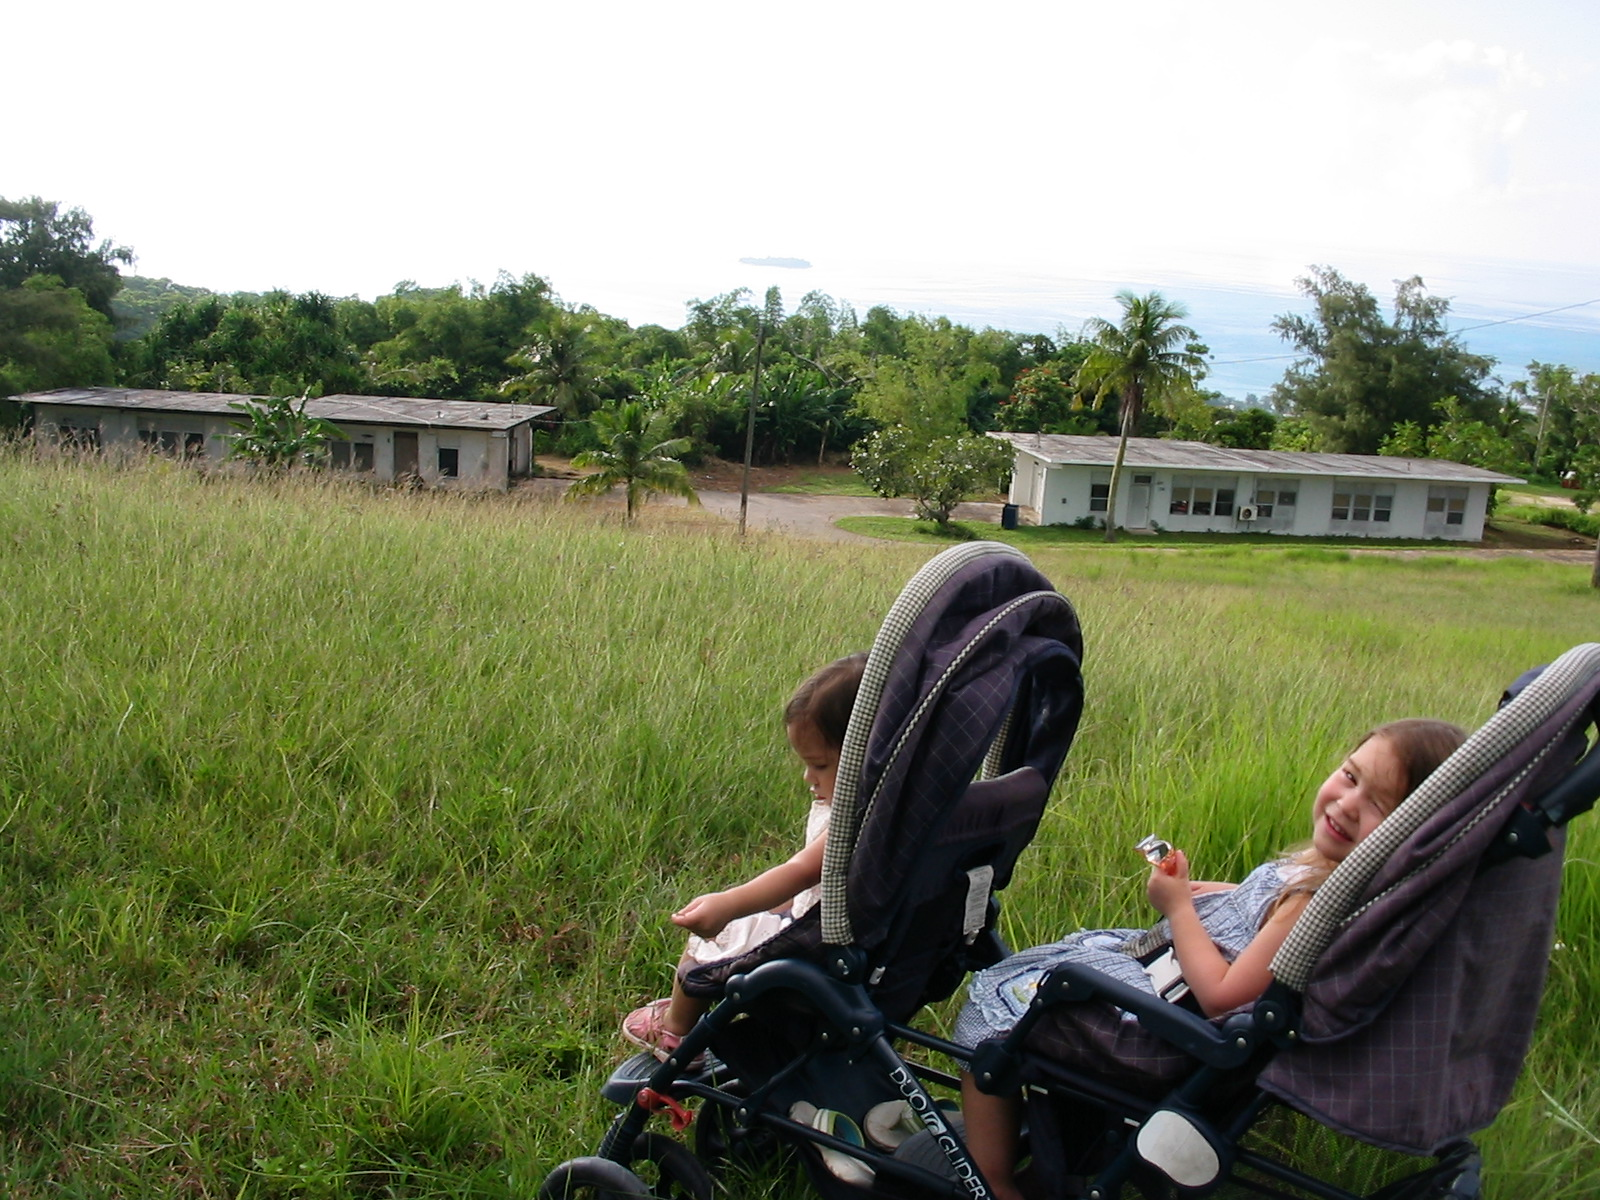 IMG_5818 - Pelaiah Heistheway Saipan stroller.JPG